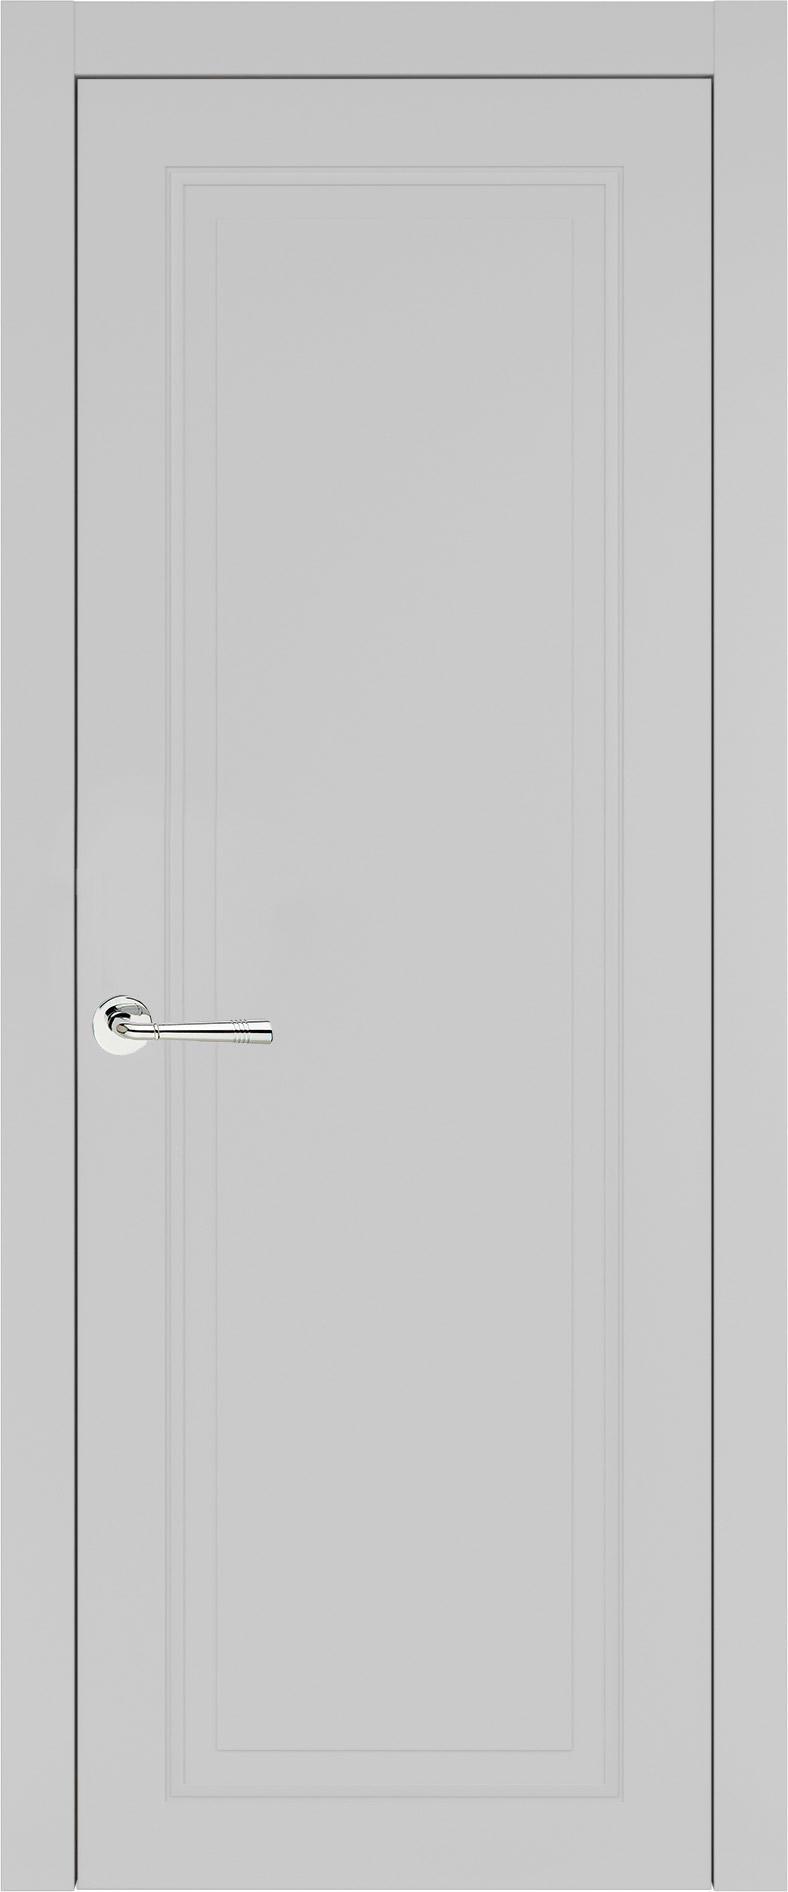 Domenica Neo Classic цвет - Серая эмаль (RAL 7047) Без стекла (ДГ)